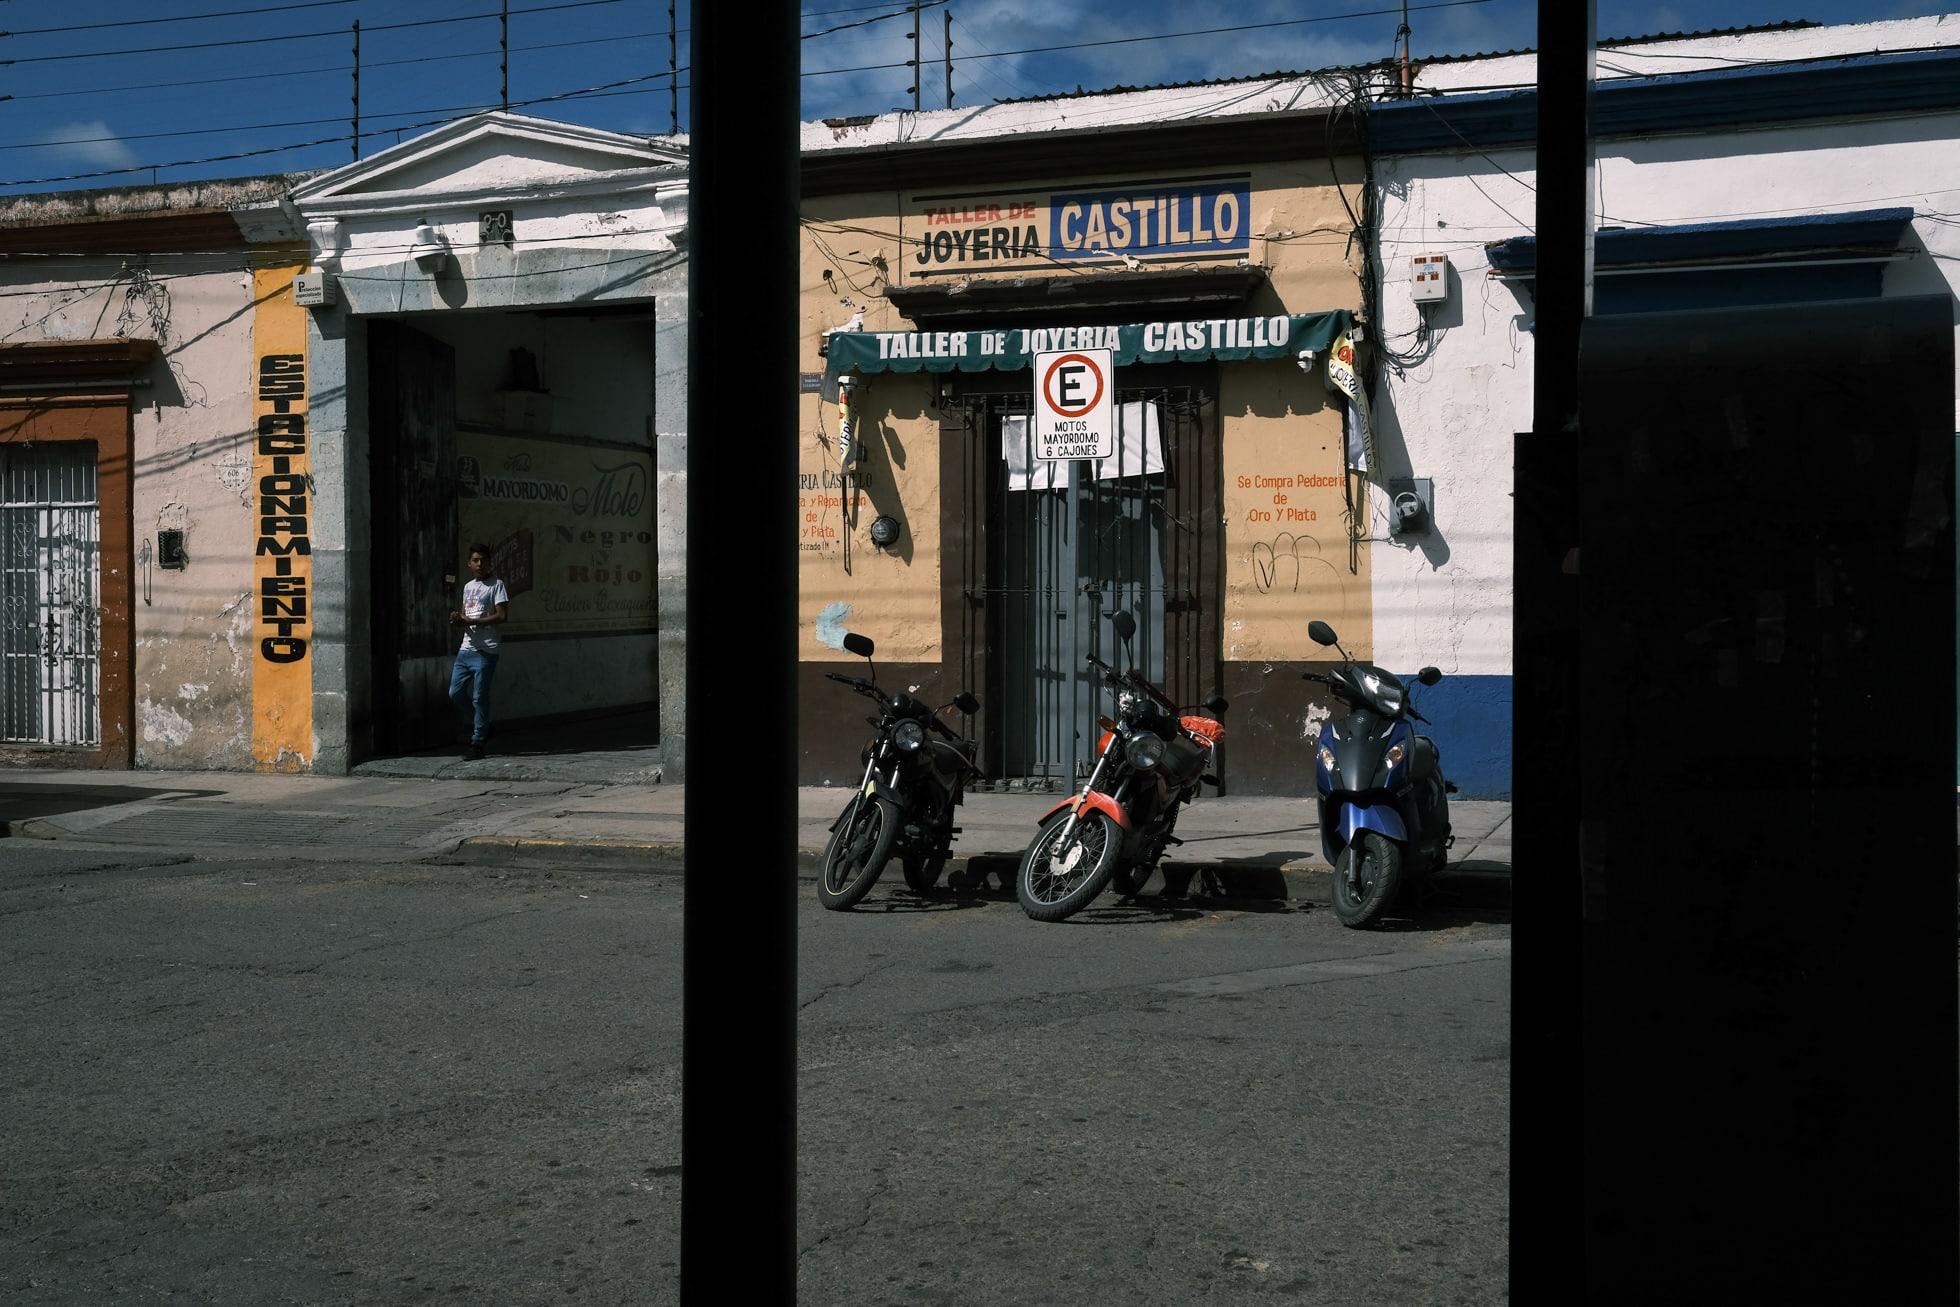 fujifilm-x-pro3-oaxaca-street-photography-14